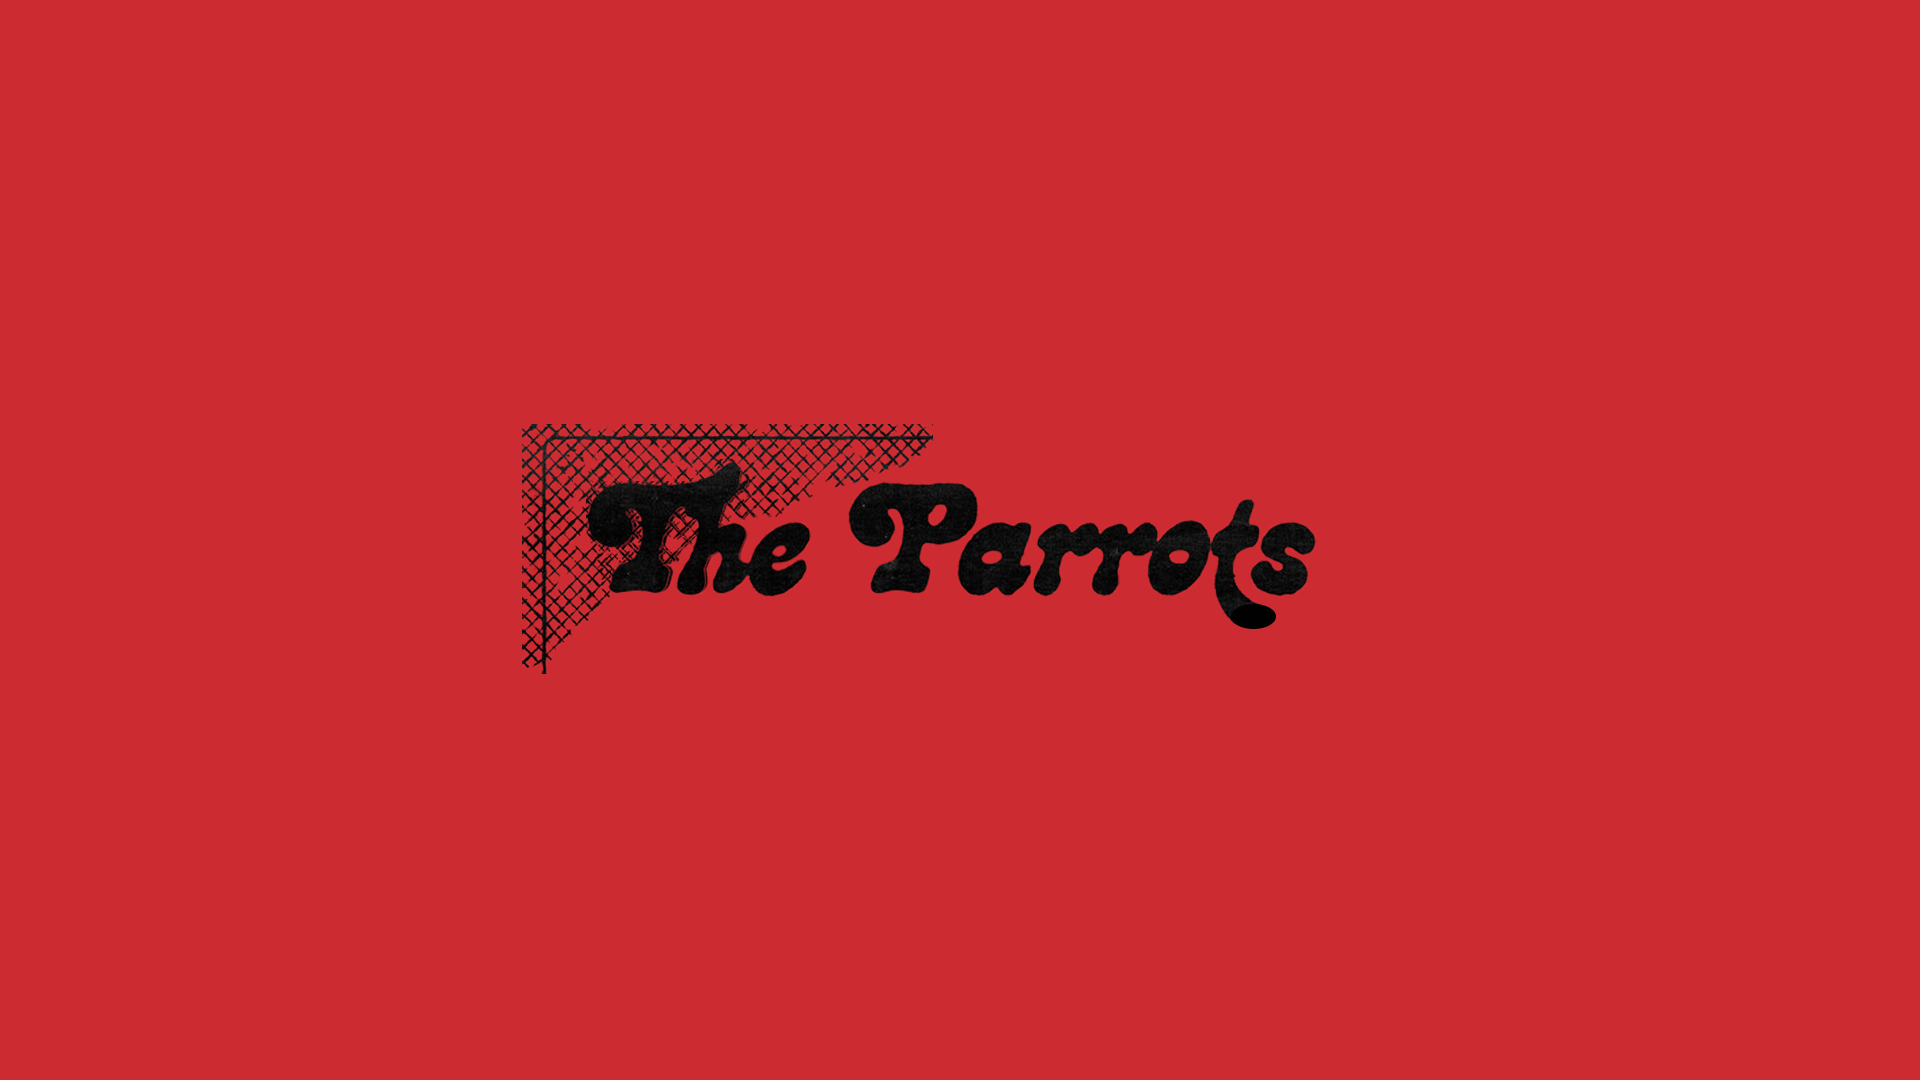 The Parrots, web hecha por murciègalo